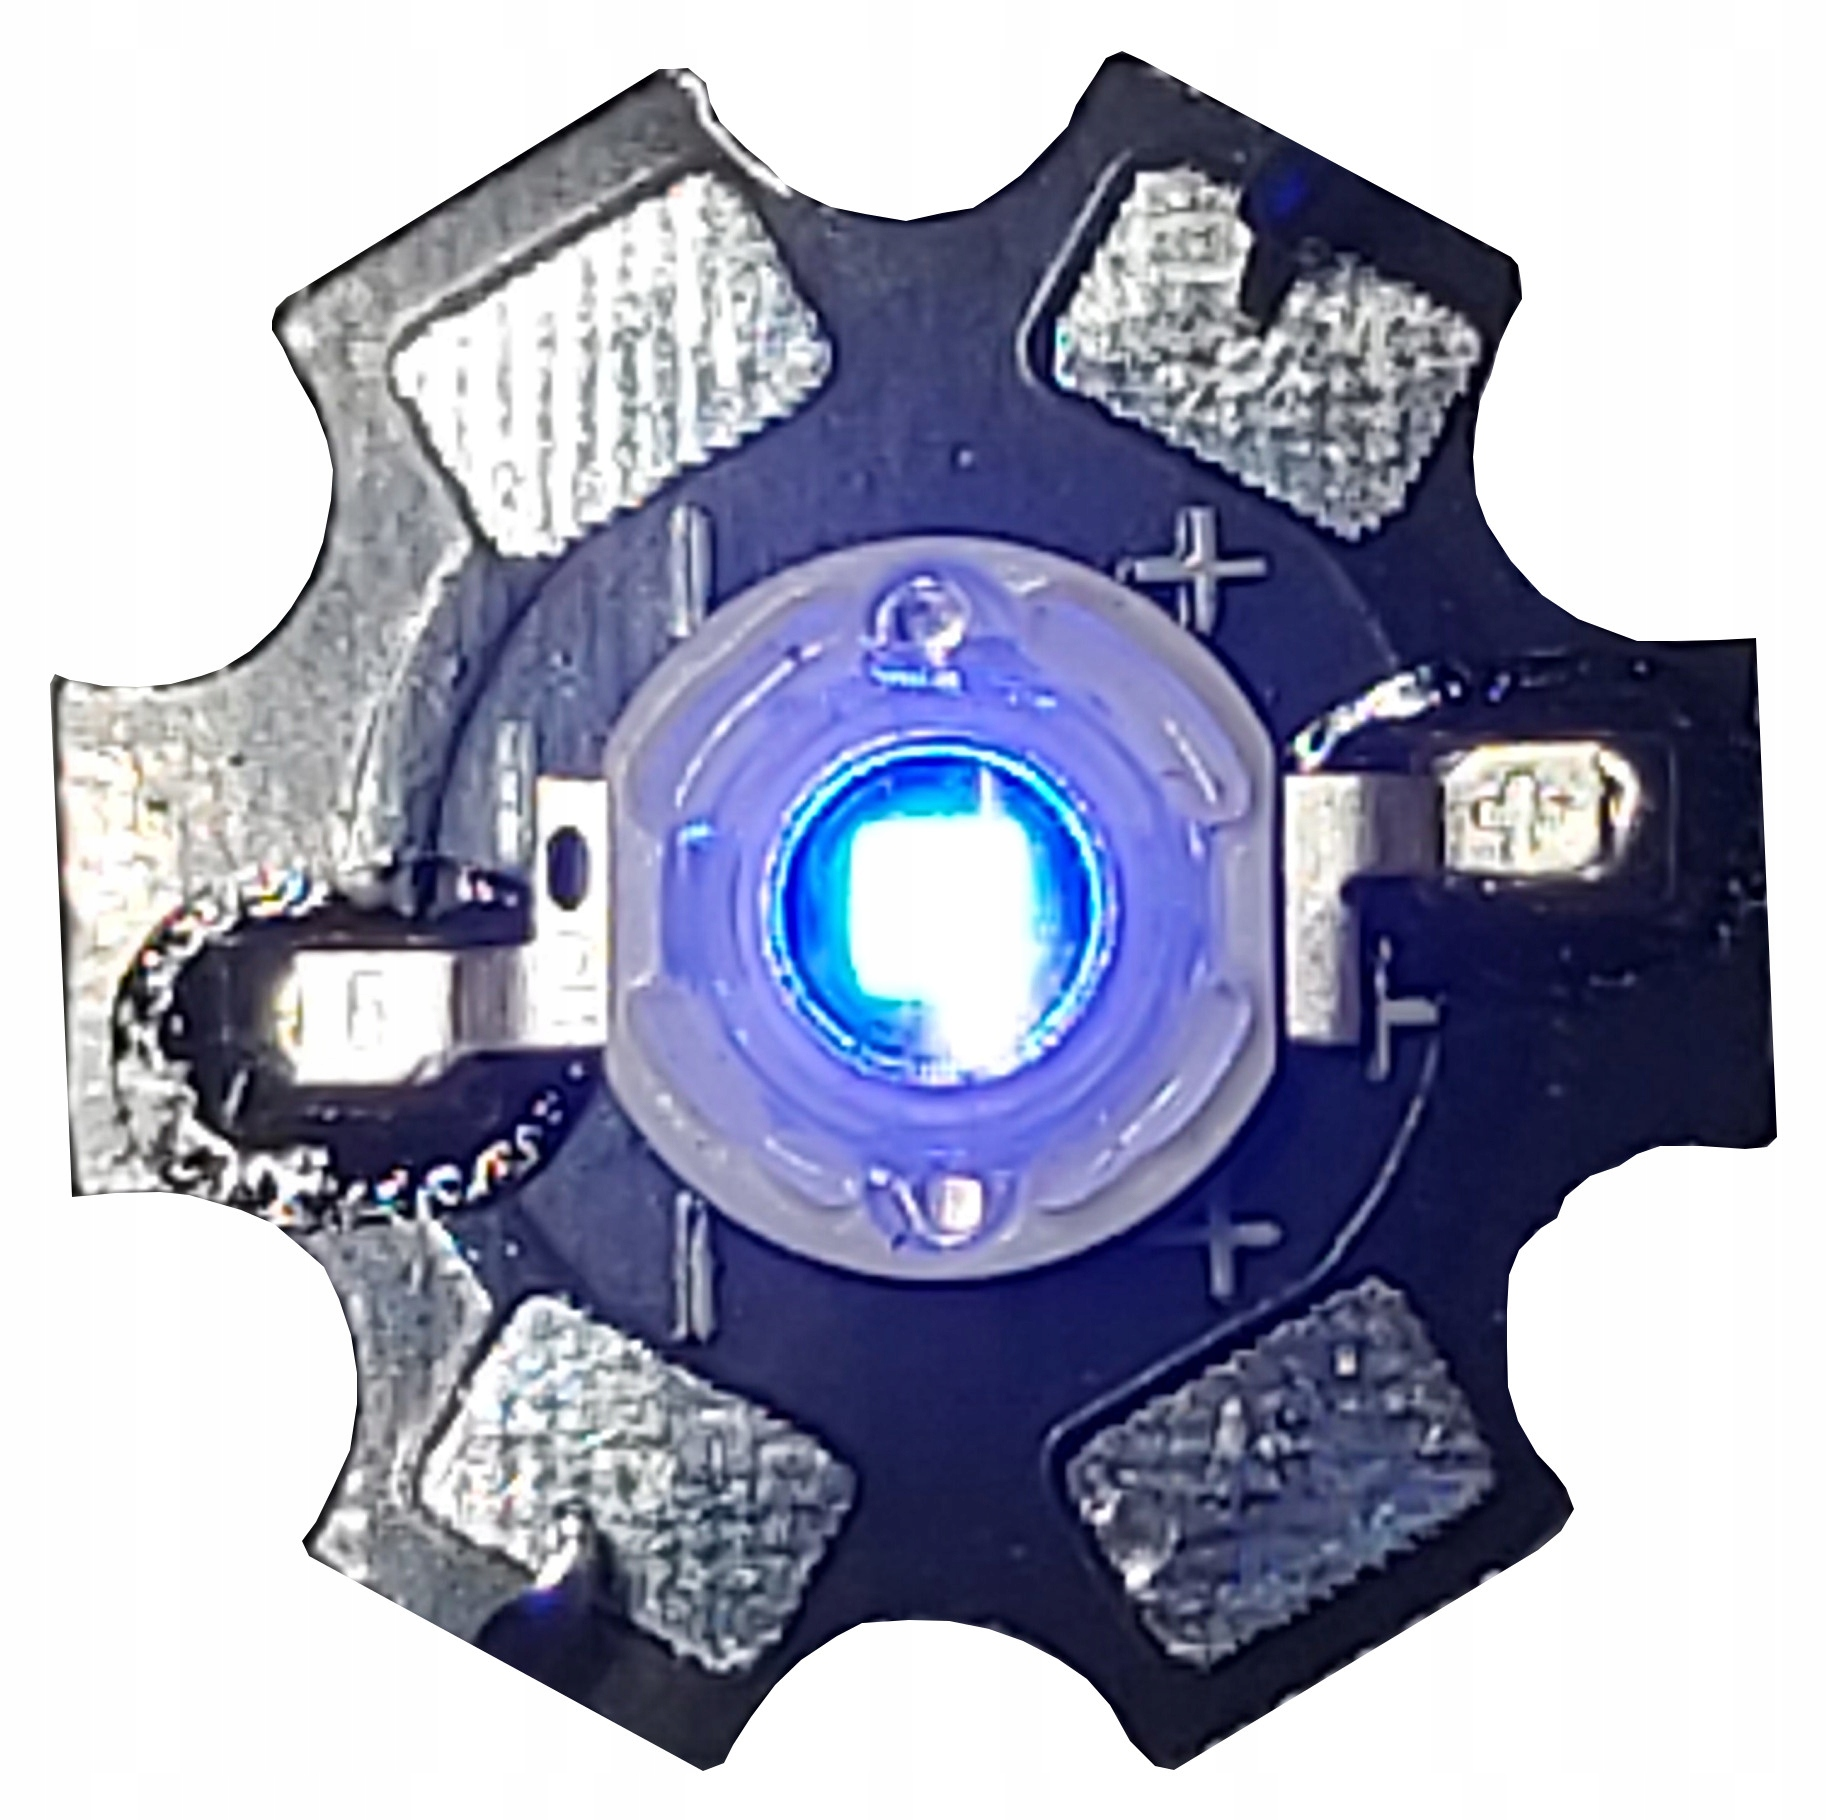 Светодиод POWER LED 1W EPISTAR Royal Blue 450nm PCB